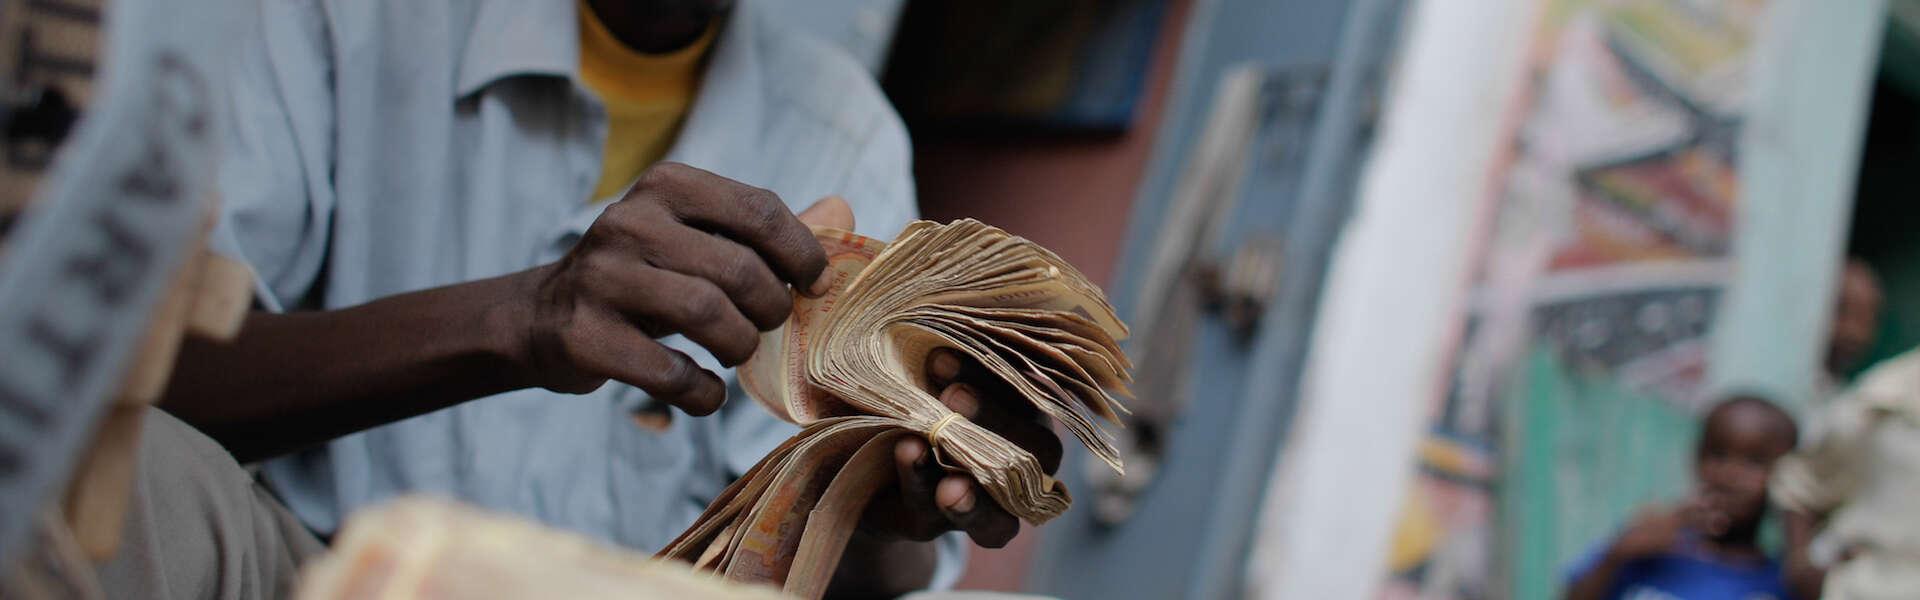 A money exchanger counts Somali shilling notes on the streets of the Somali capital Mogadishu. NextBillion.net